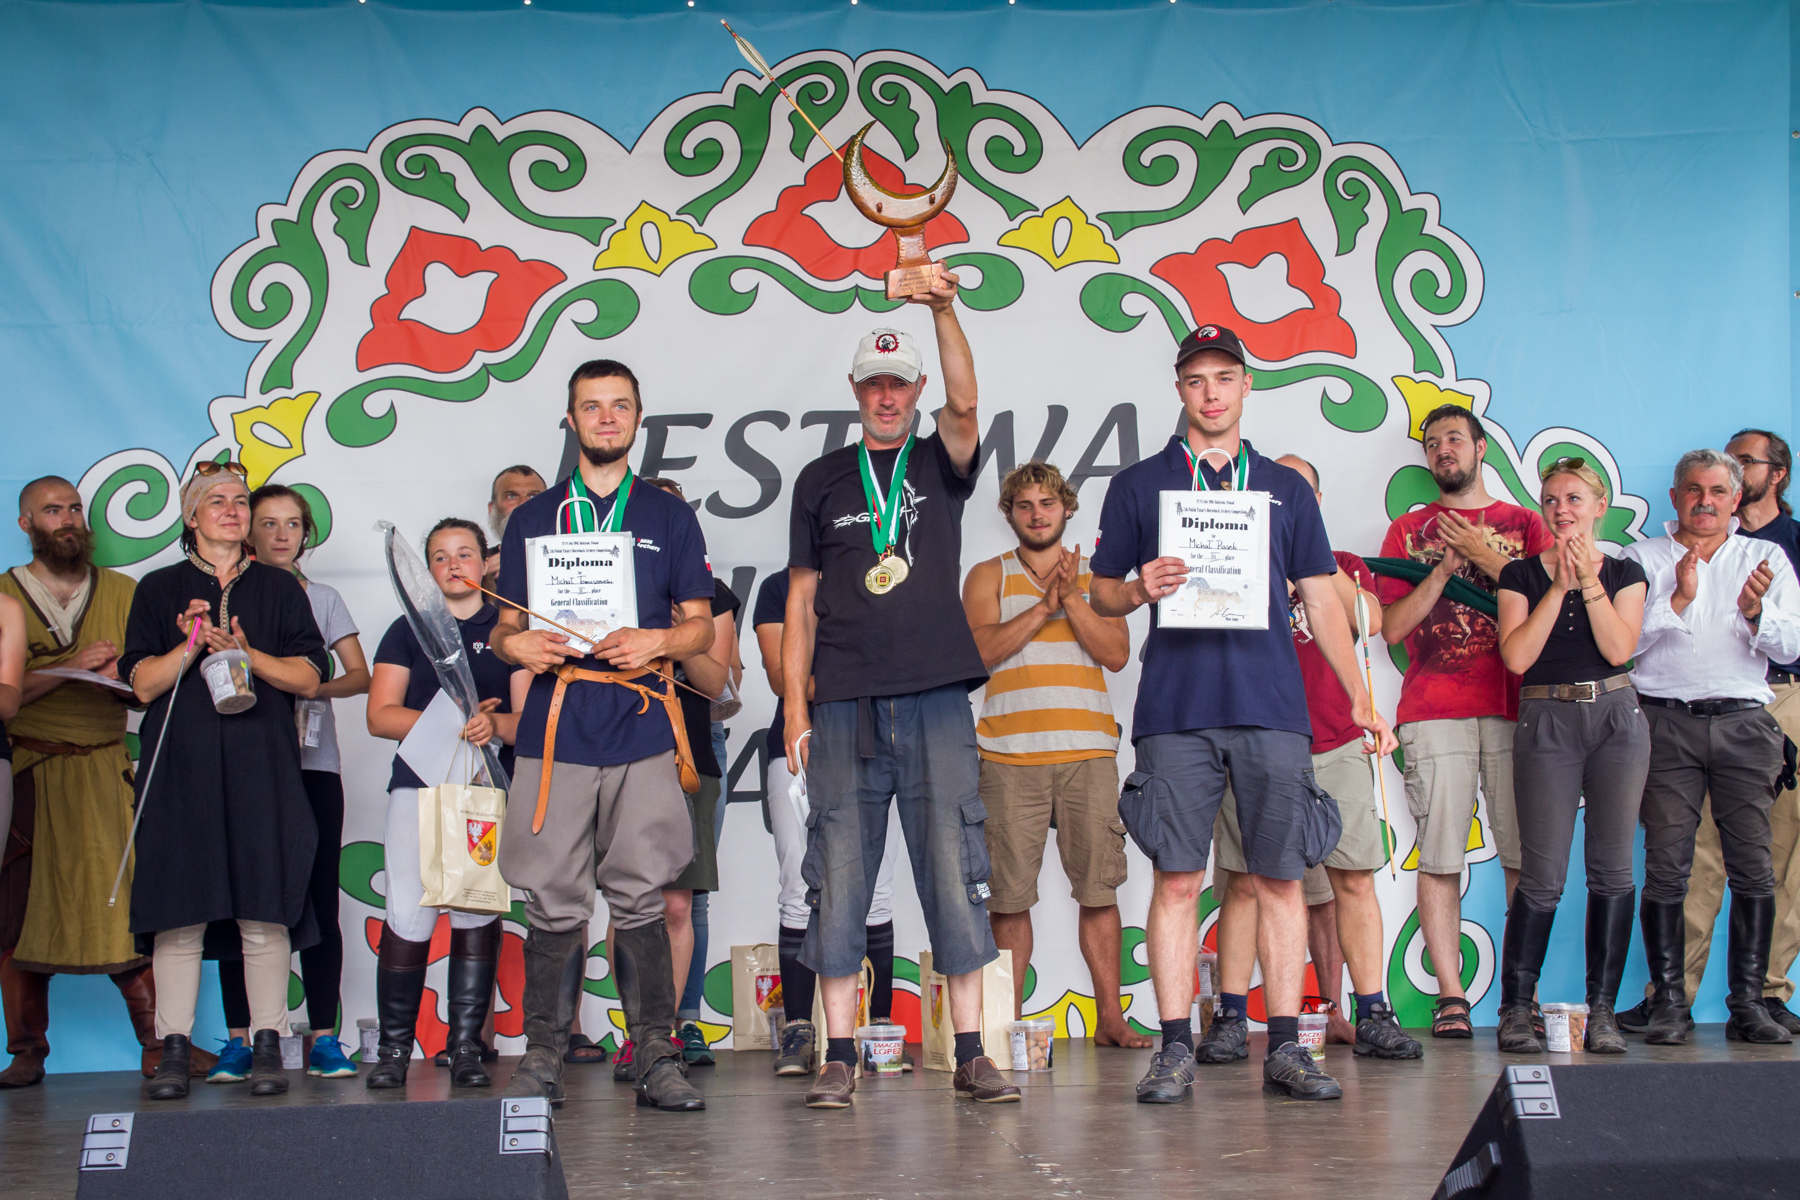 2016.Festiwal.095